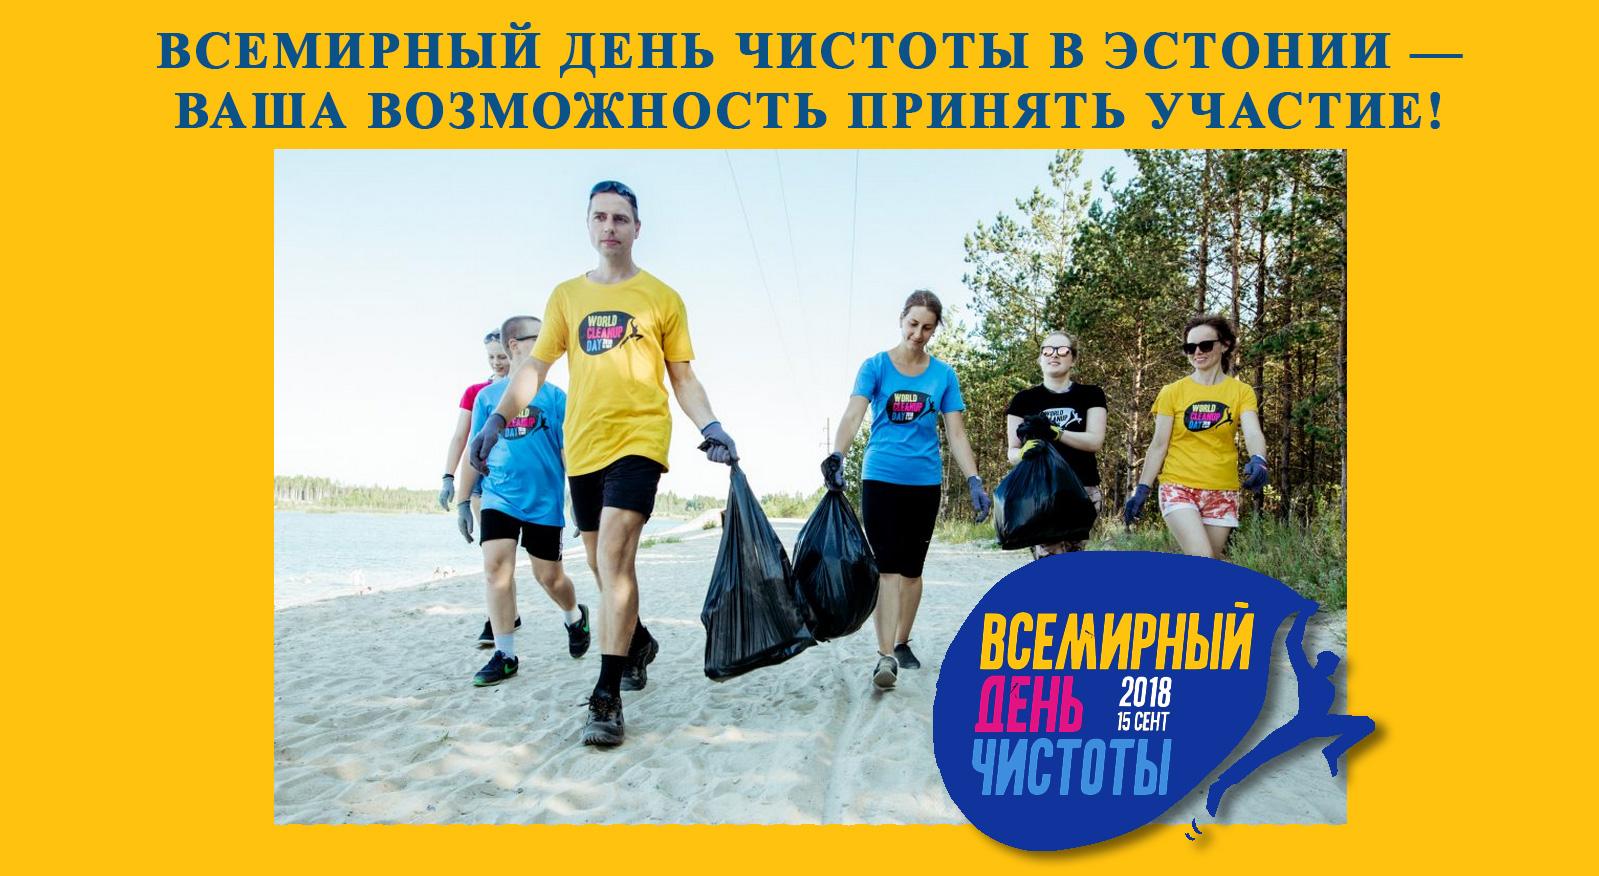 World Cleanup Day: открыта регистрация на русском языке